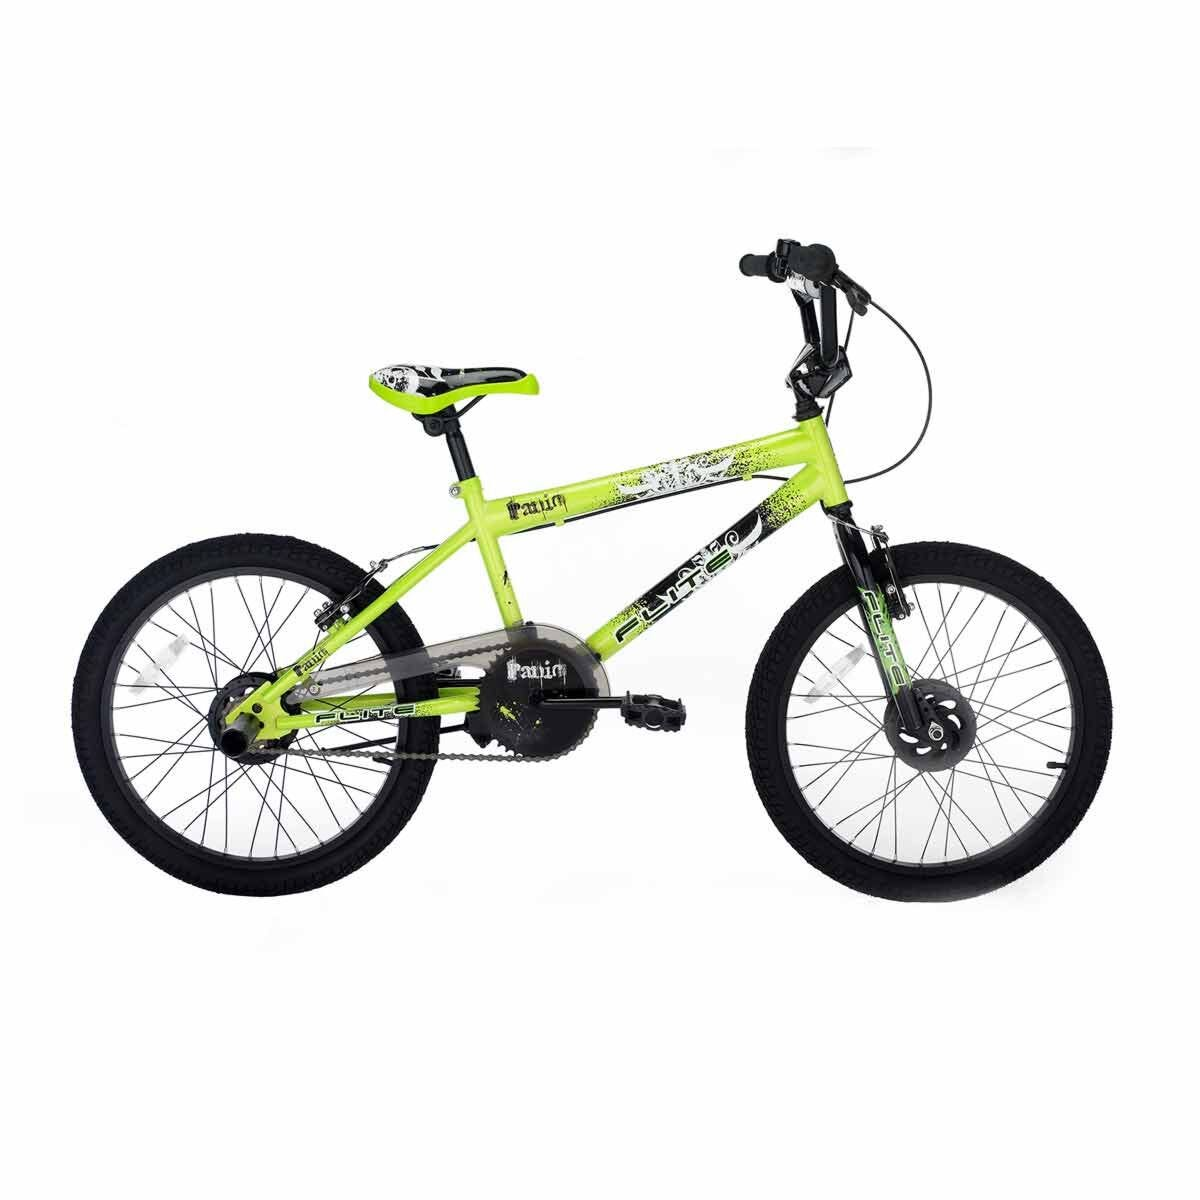 Flite Panic Kids BMX Bike 20 Inch Wheel